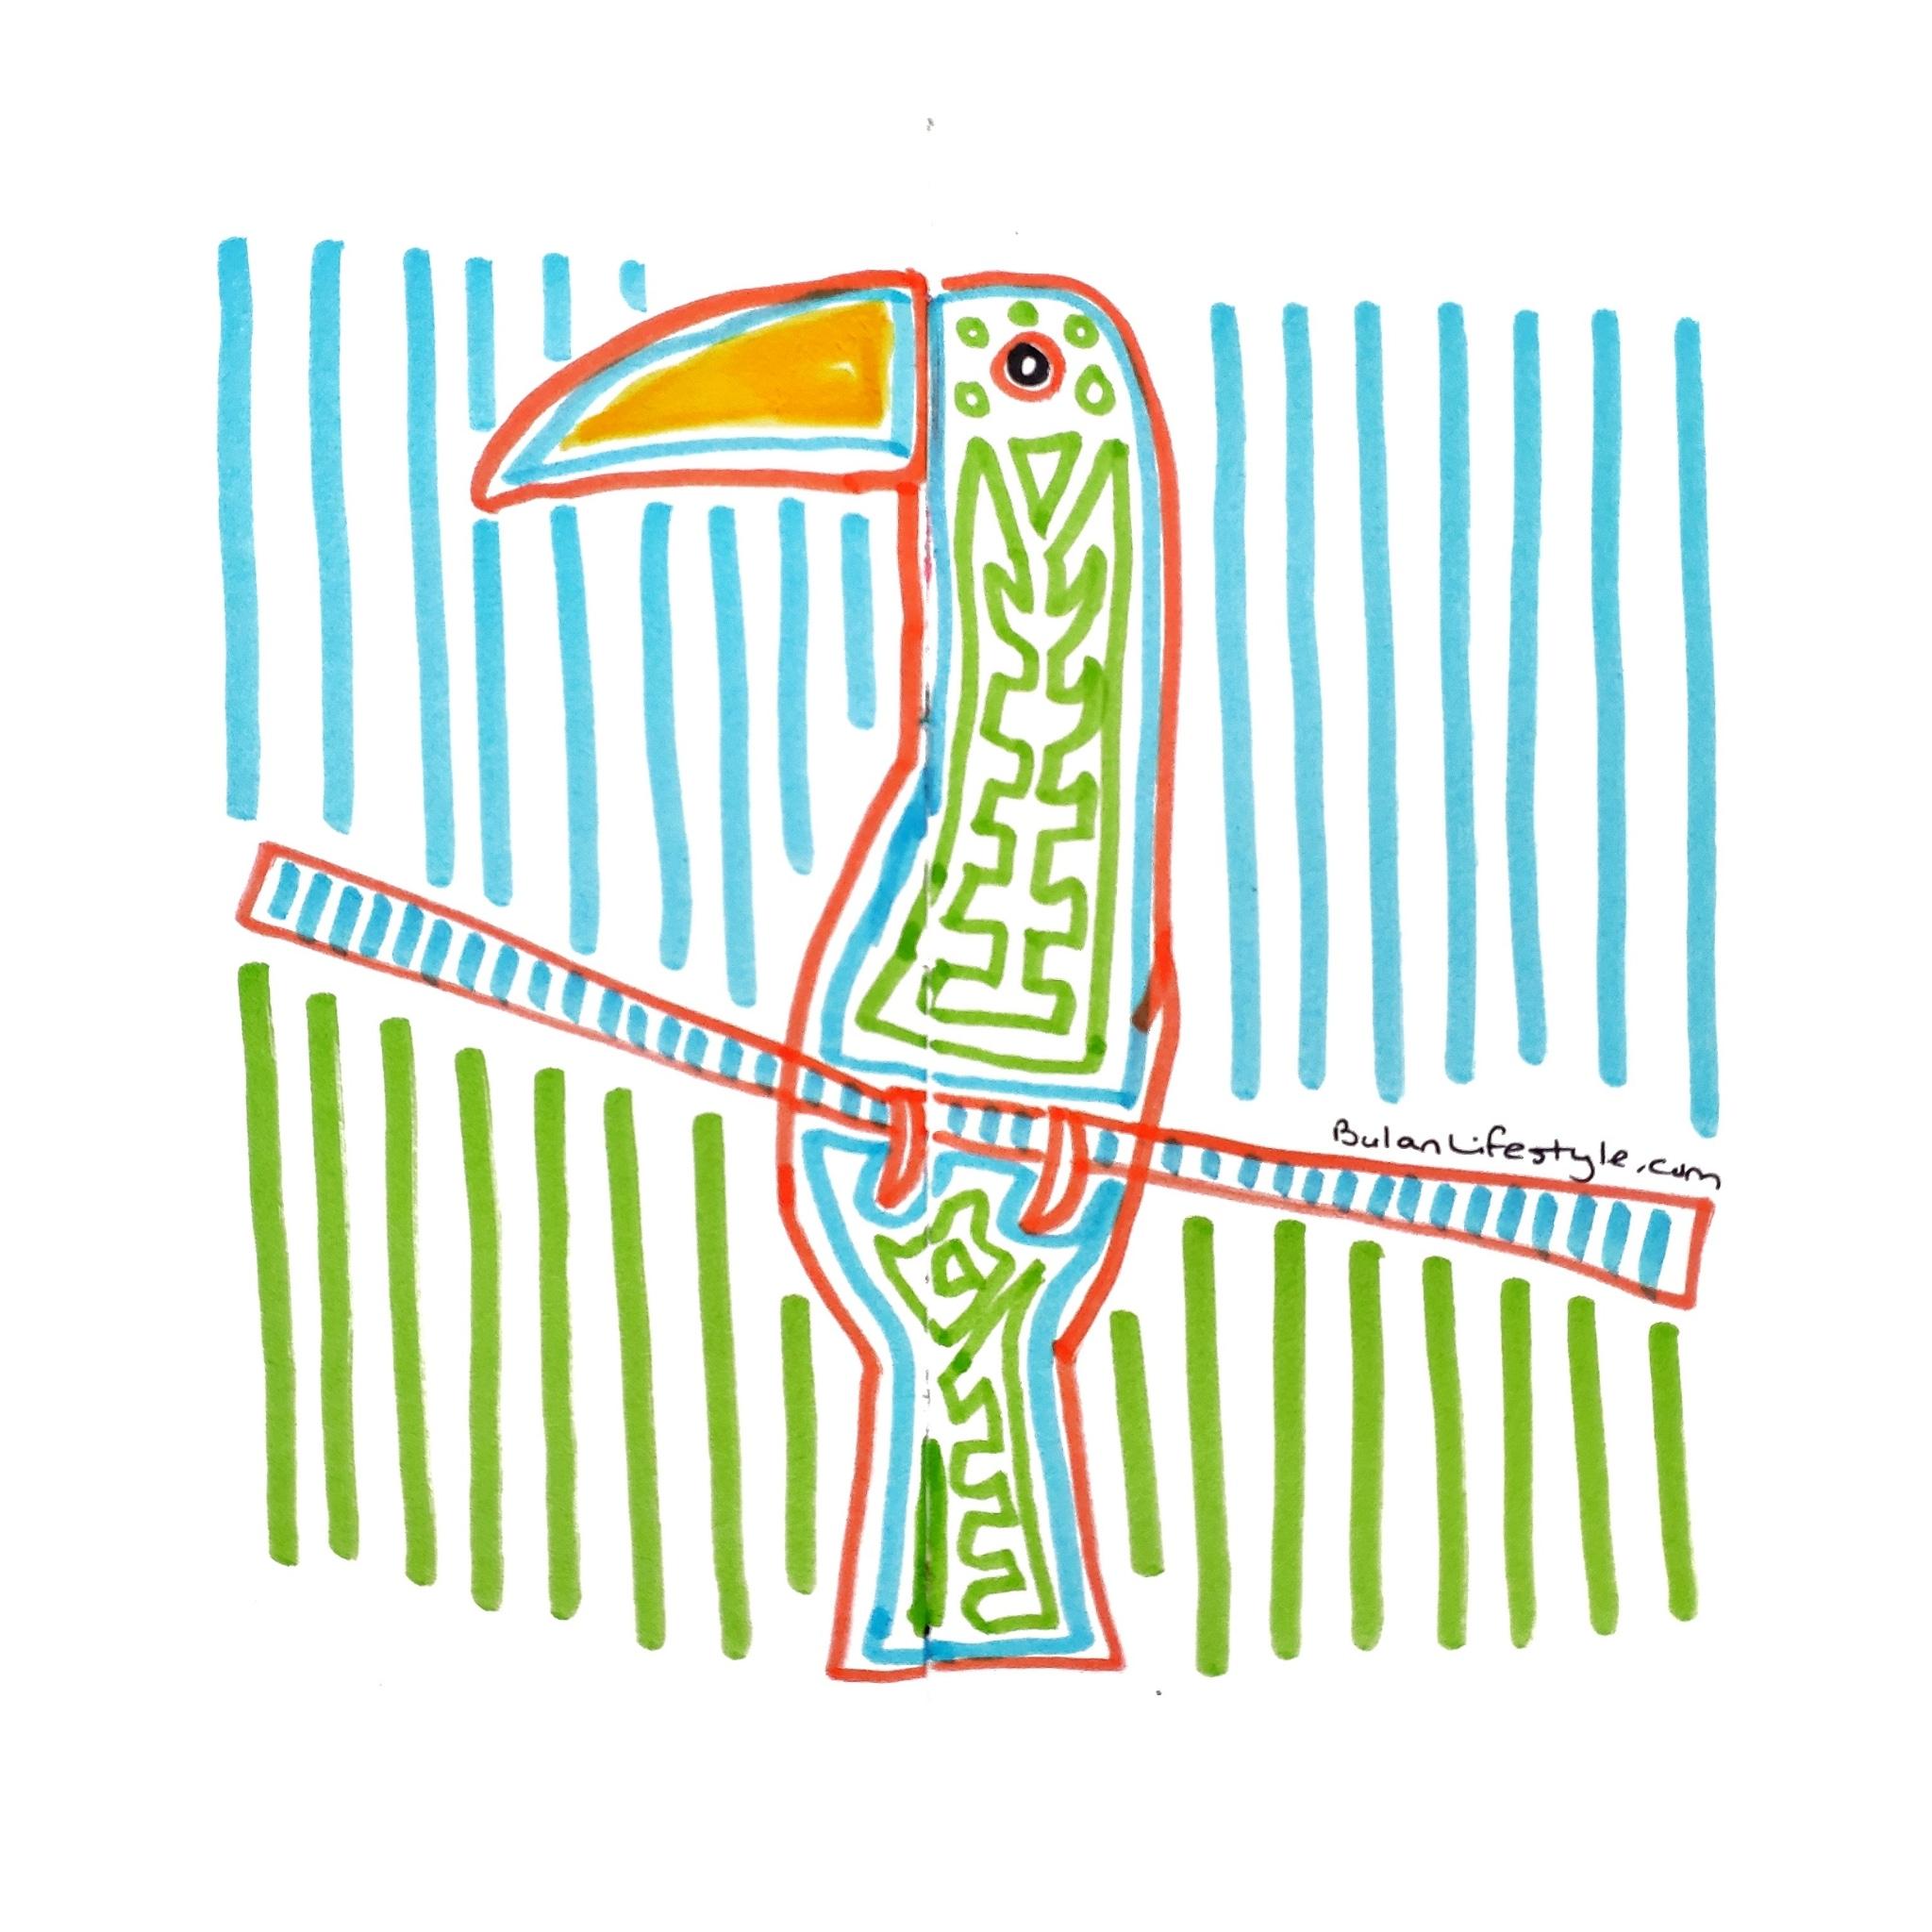 Toucan folk art in the style of Guna Indian Mola art